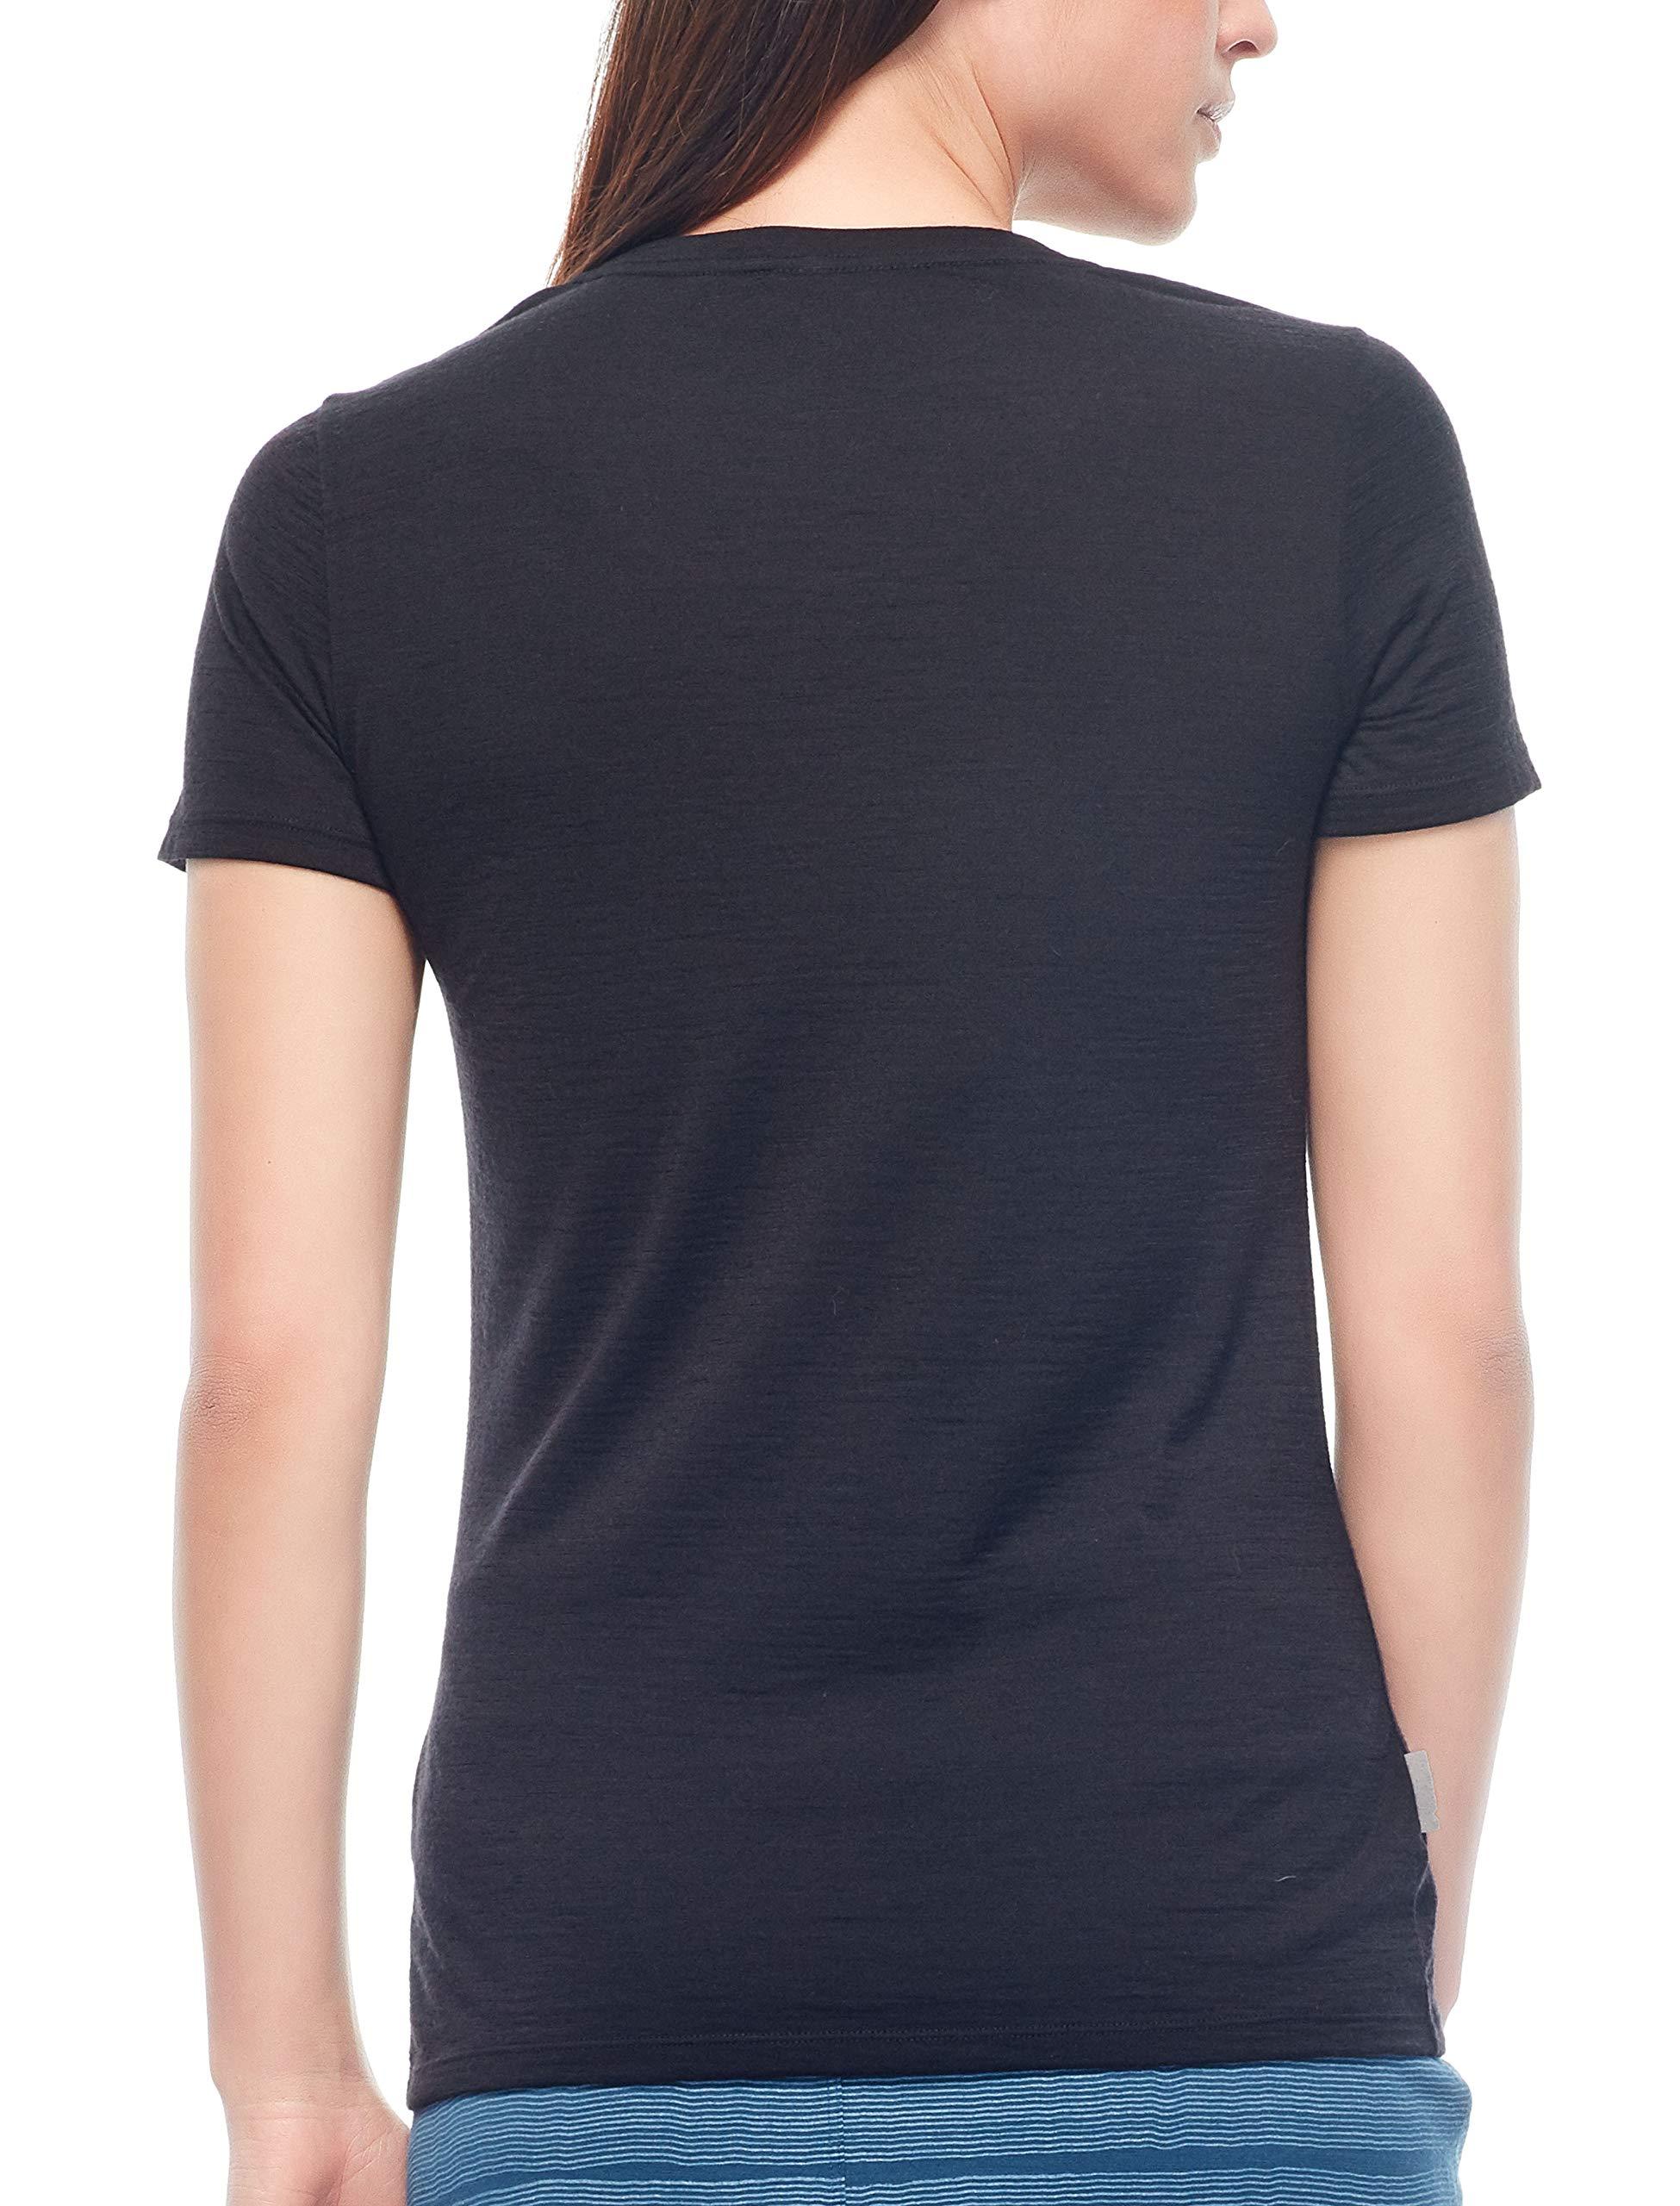 Icebreaker Women's Tech Lite Ss Low Crewe T-Shirt